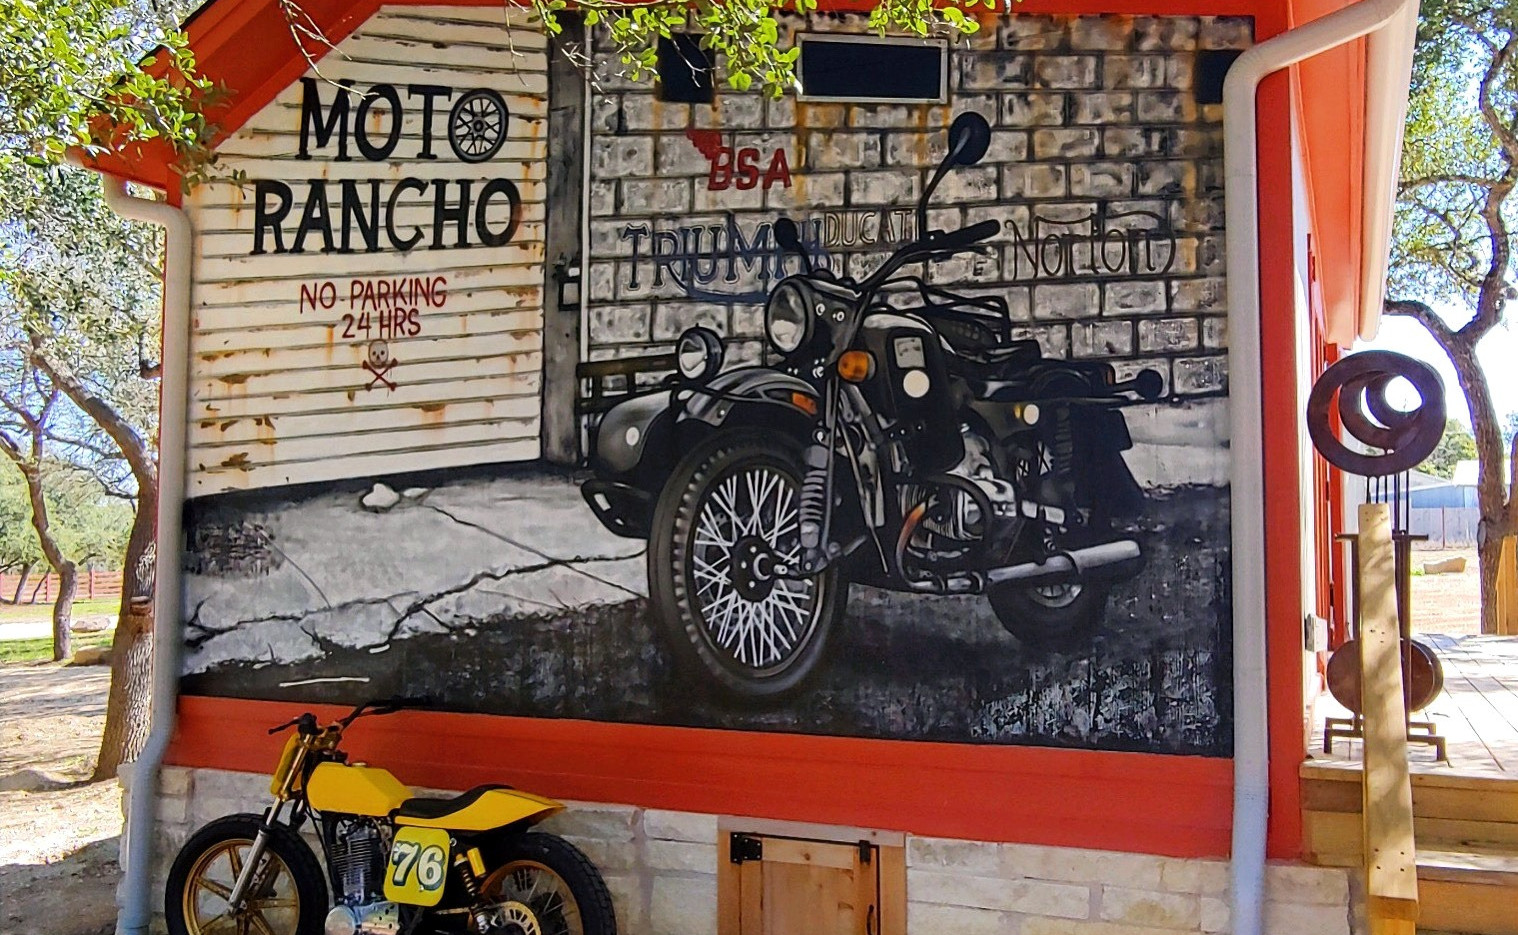 Moto Rancho